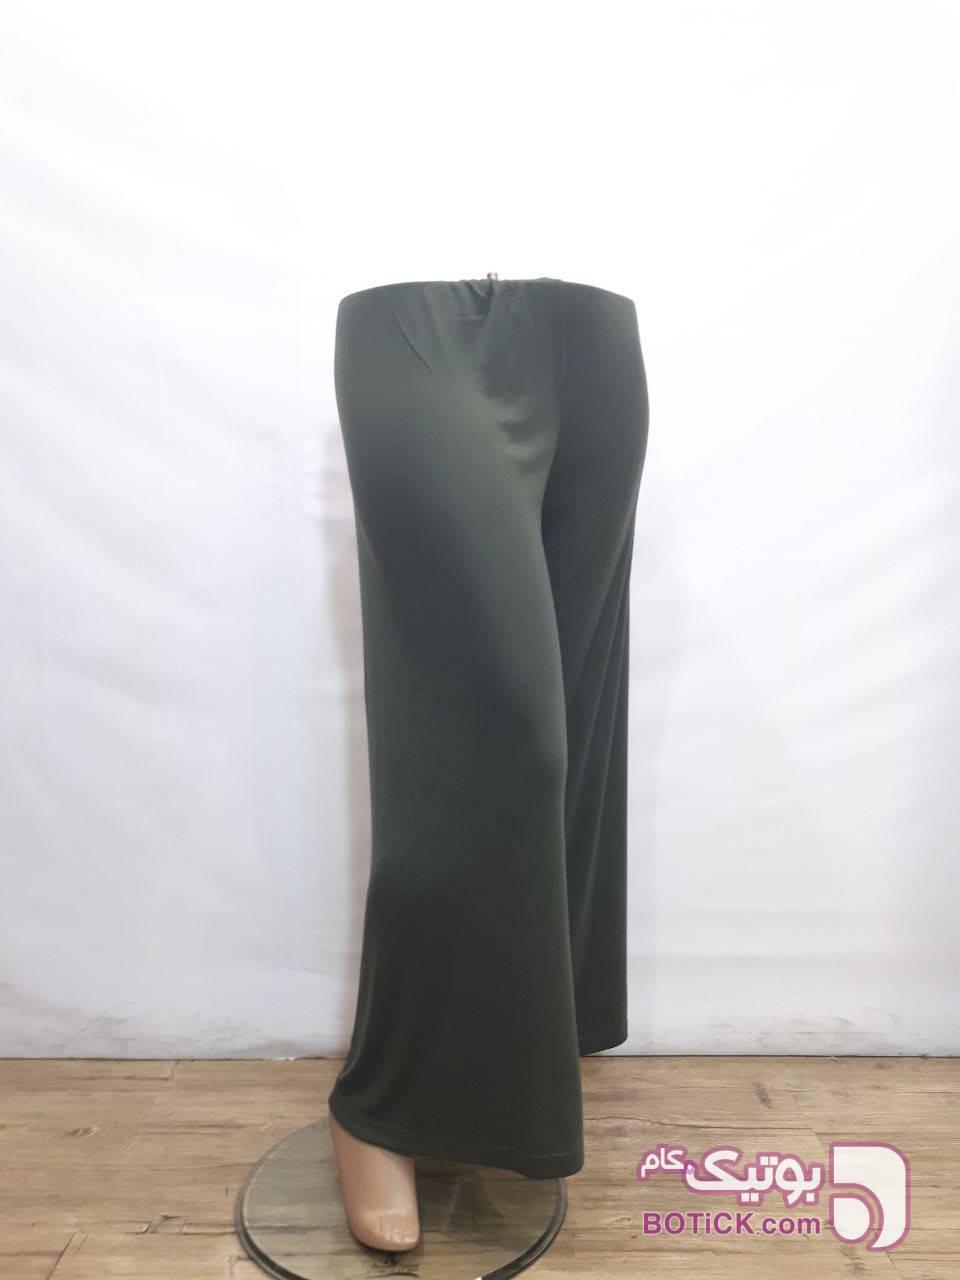 دامن شلواری تریکو فانریپ مشکی لباس راحتی زنانه